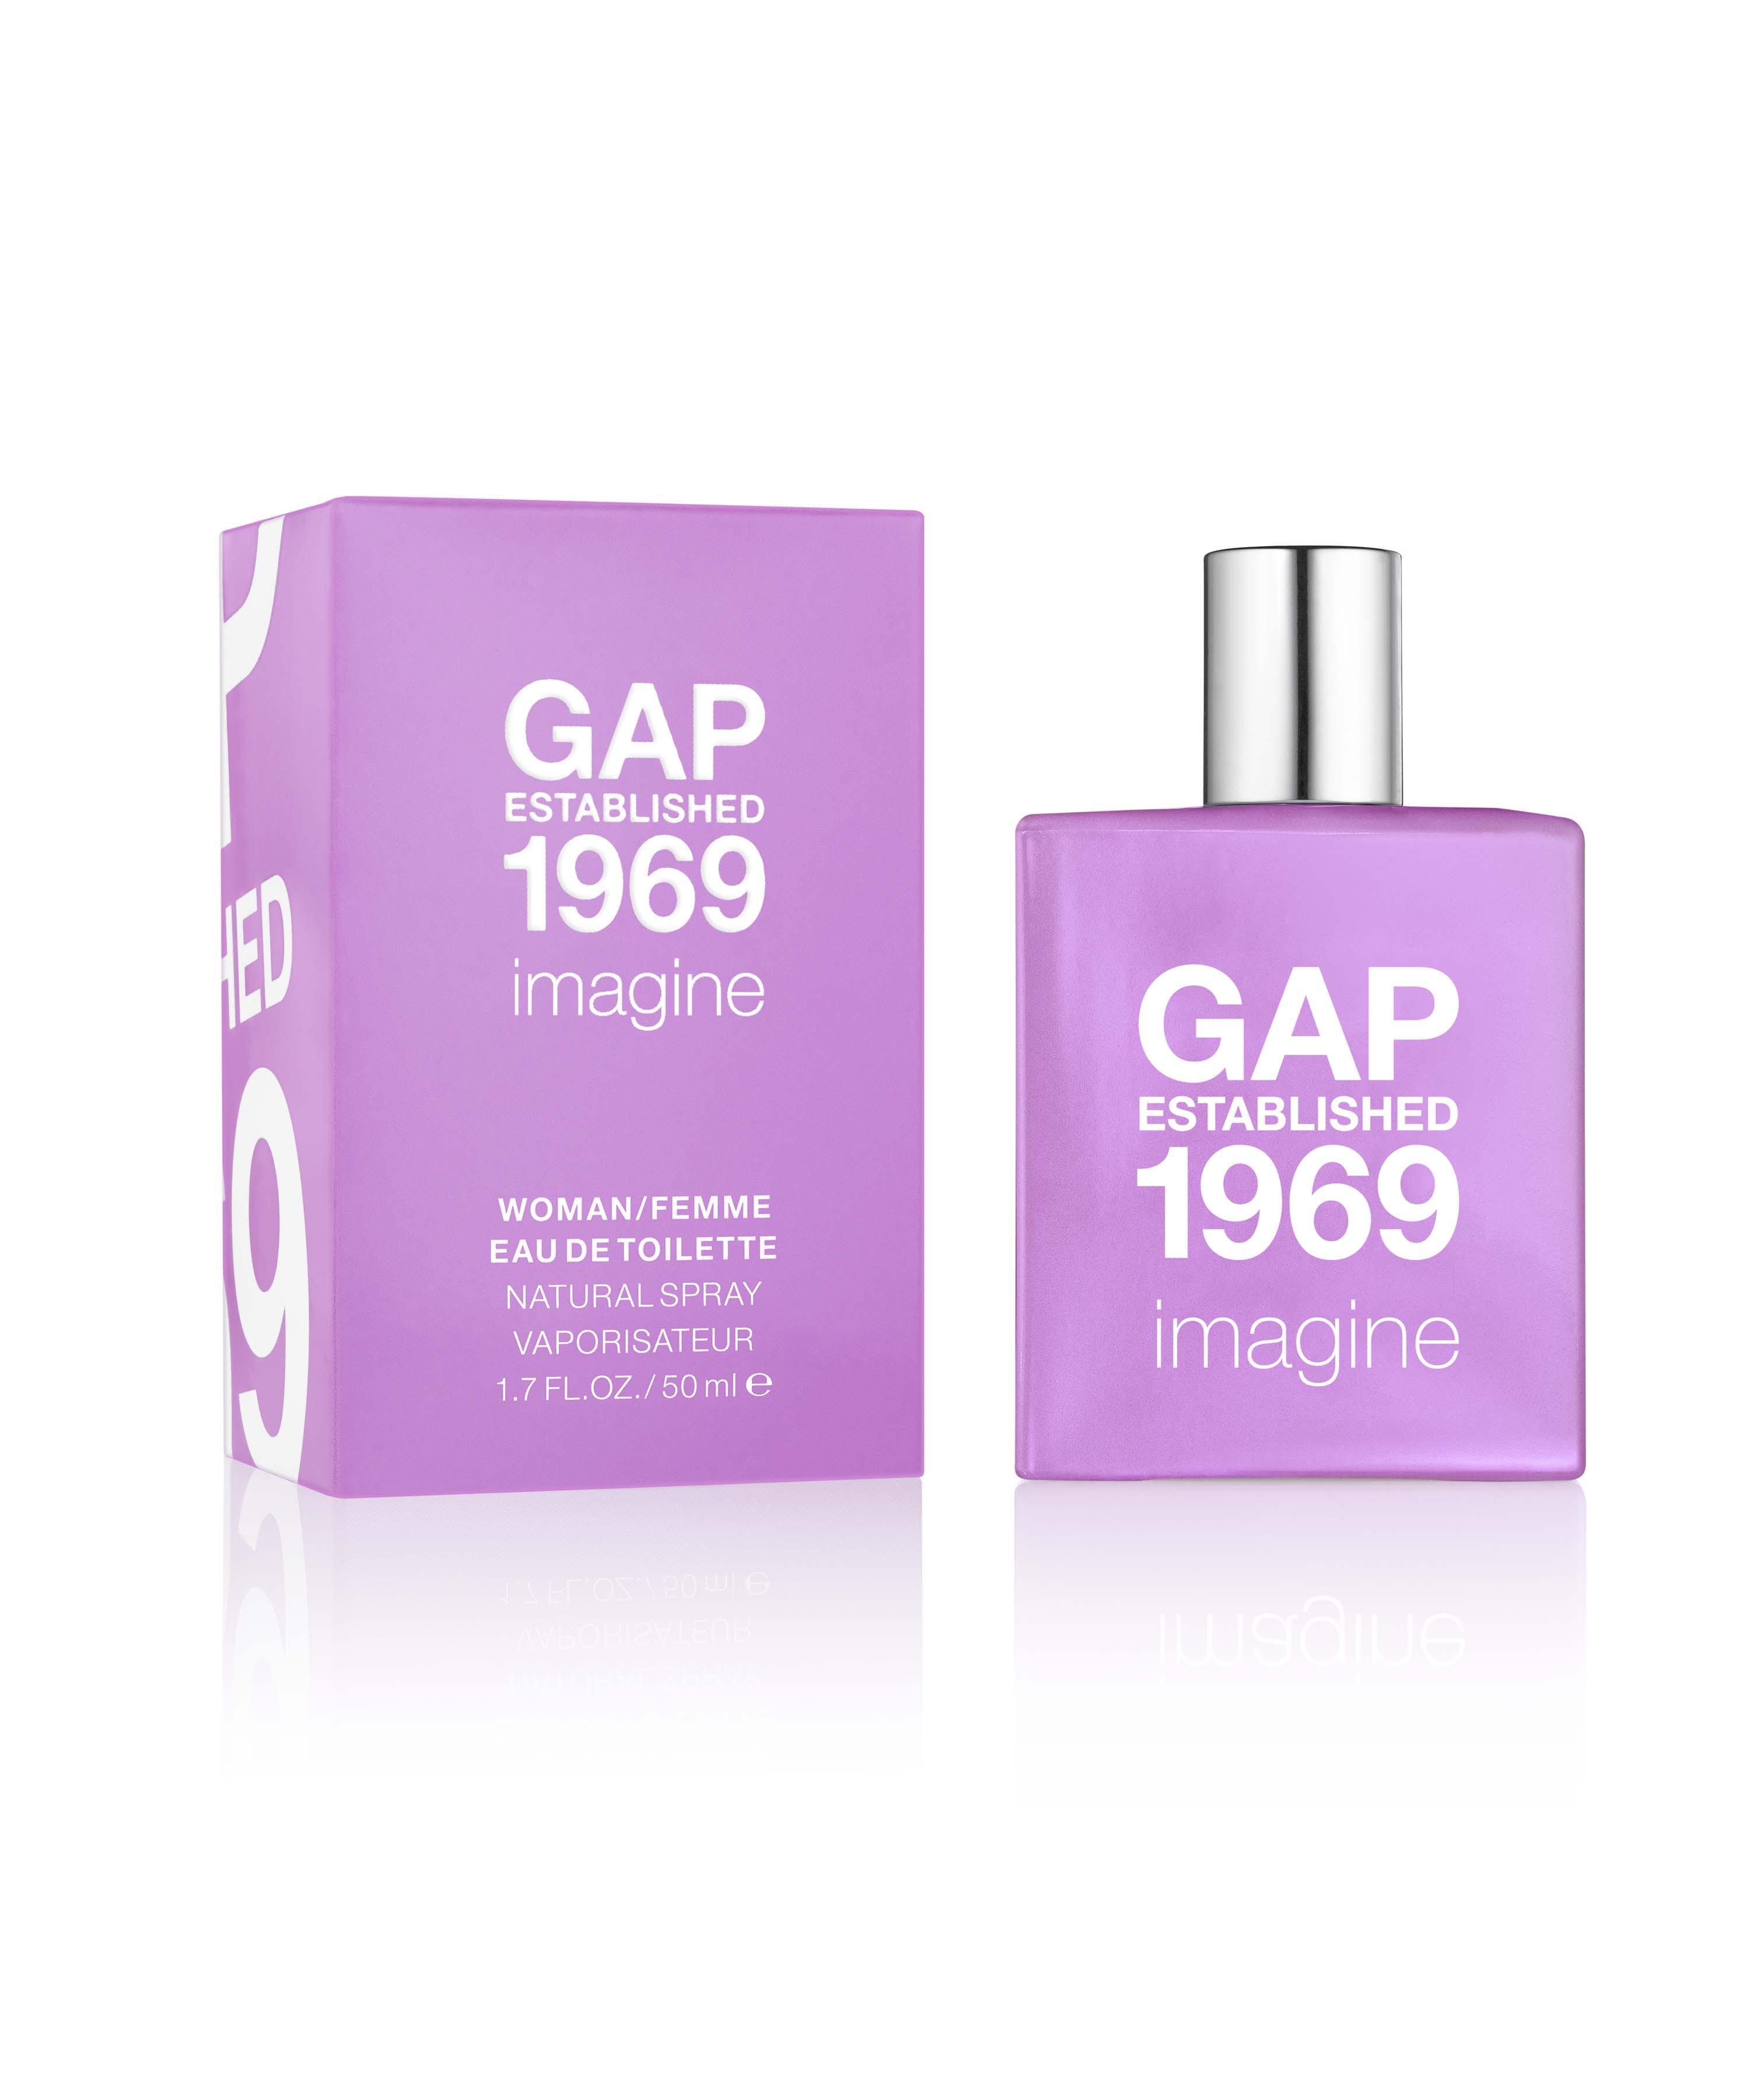 Gap Established 1969 Imagine аромат для женщин